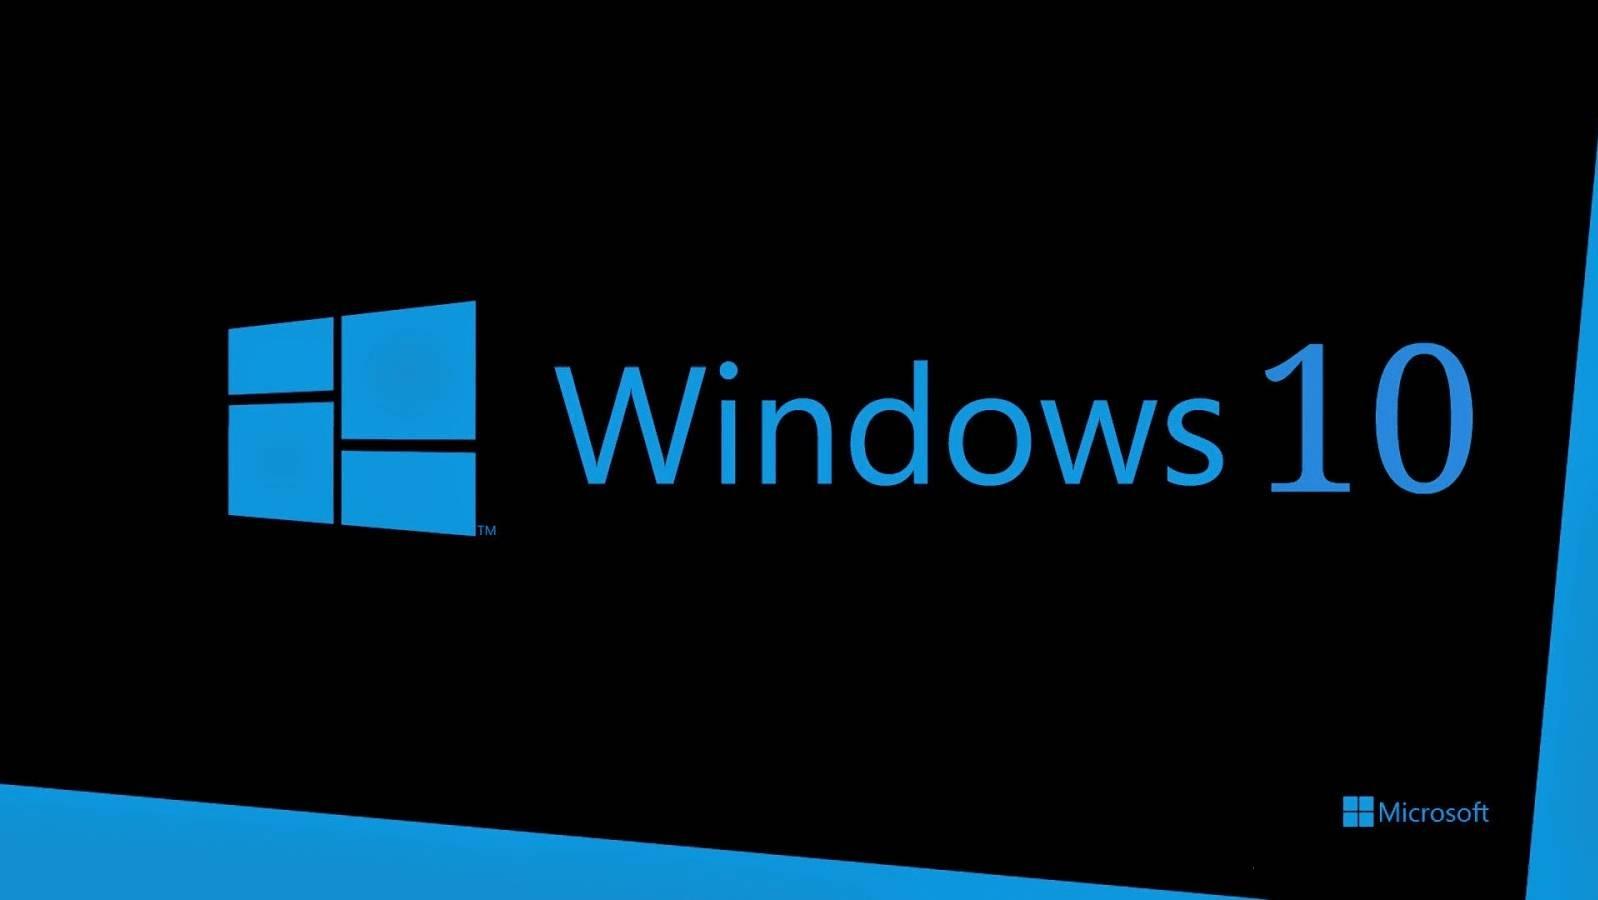 Windows 10 miliard